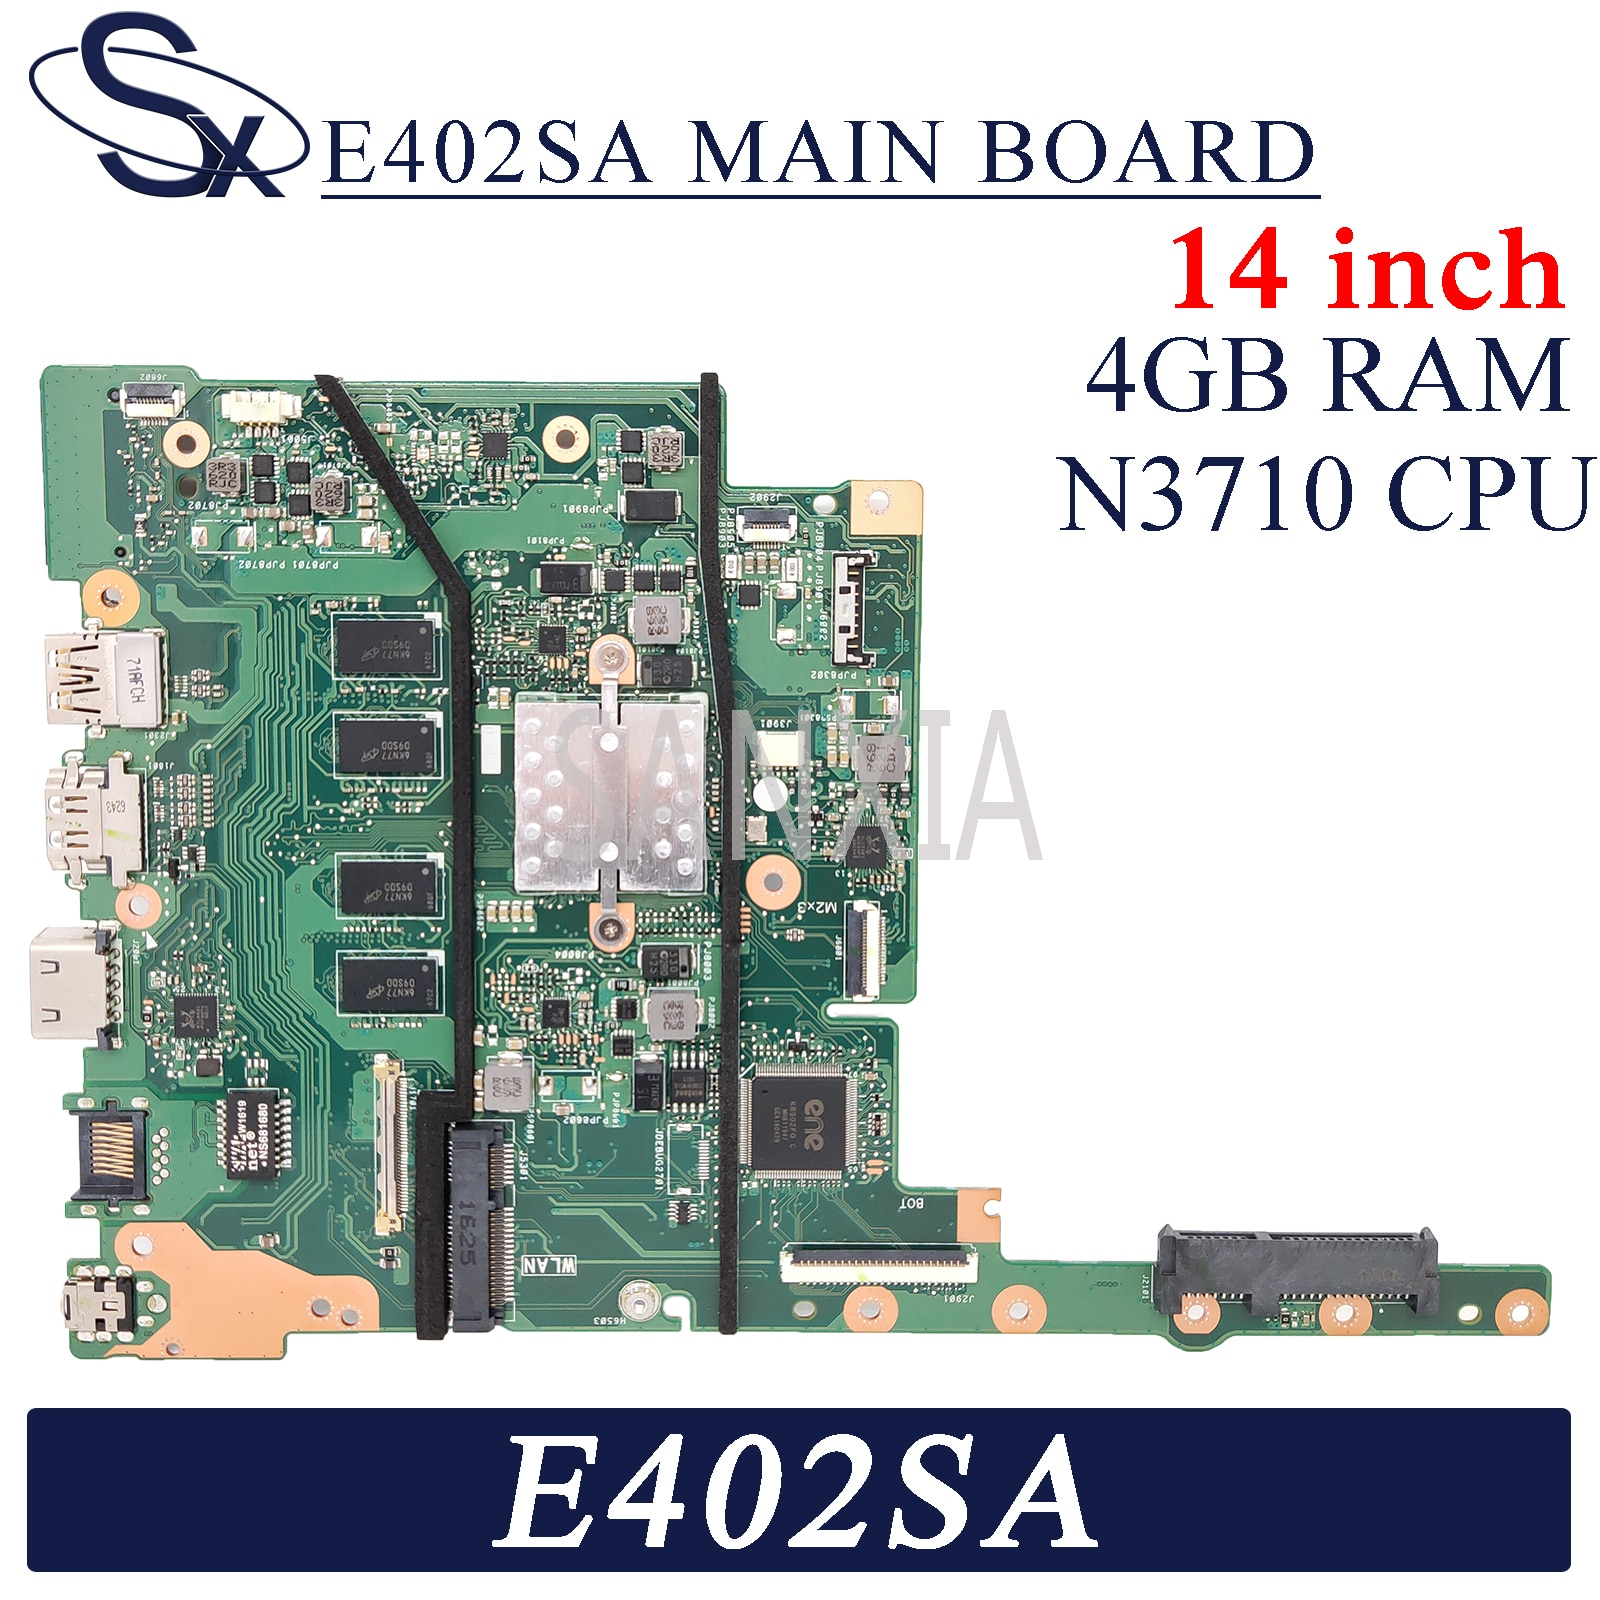 KEFU E402SA Laptop motherboard for ASUS E402SA E402S (14 inch) original mianboard 4GB-RAM N3060 CPU